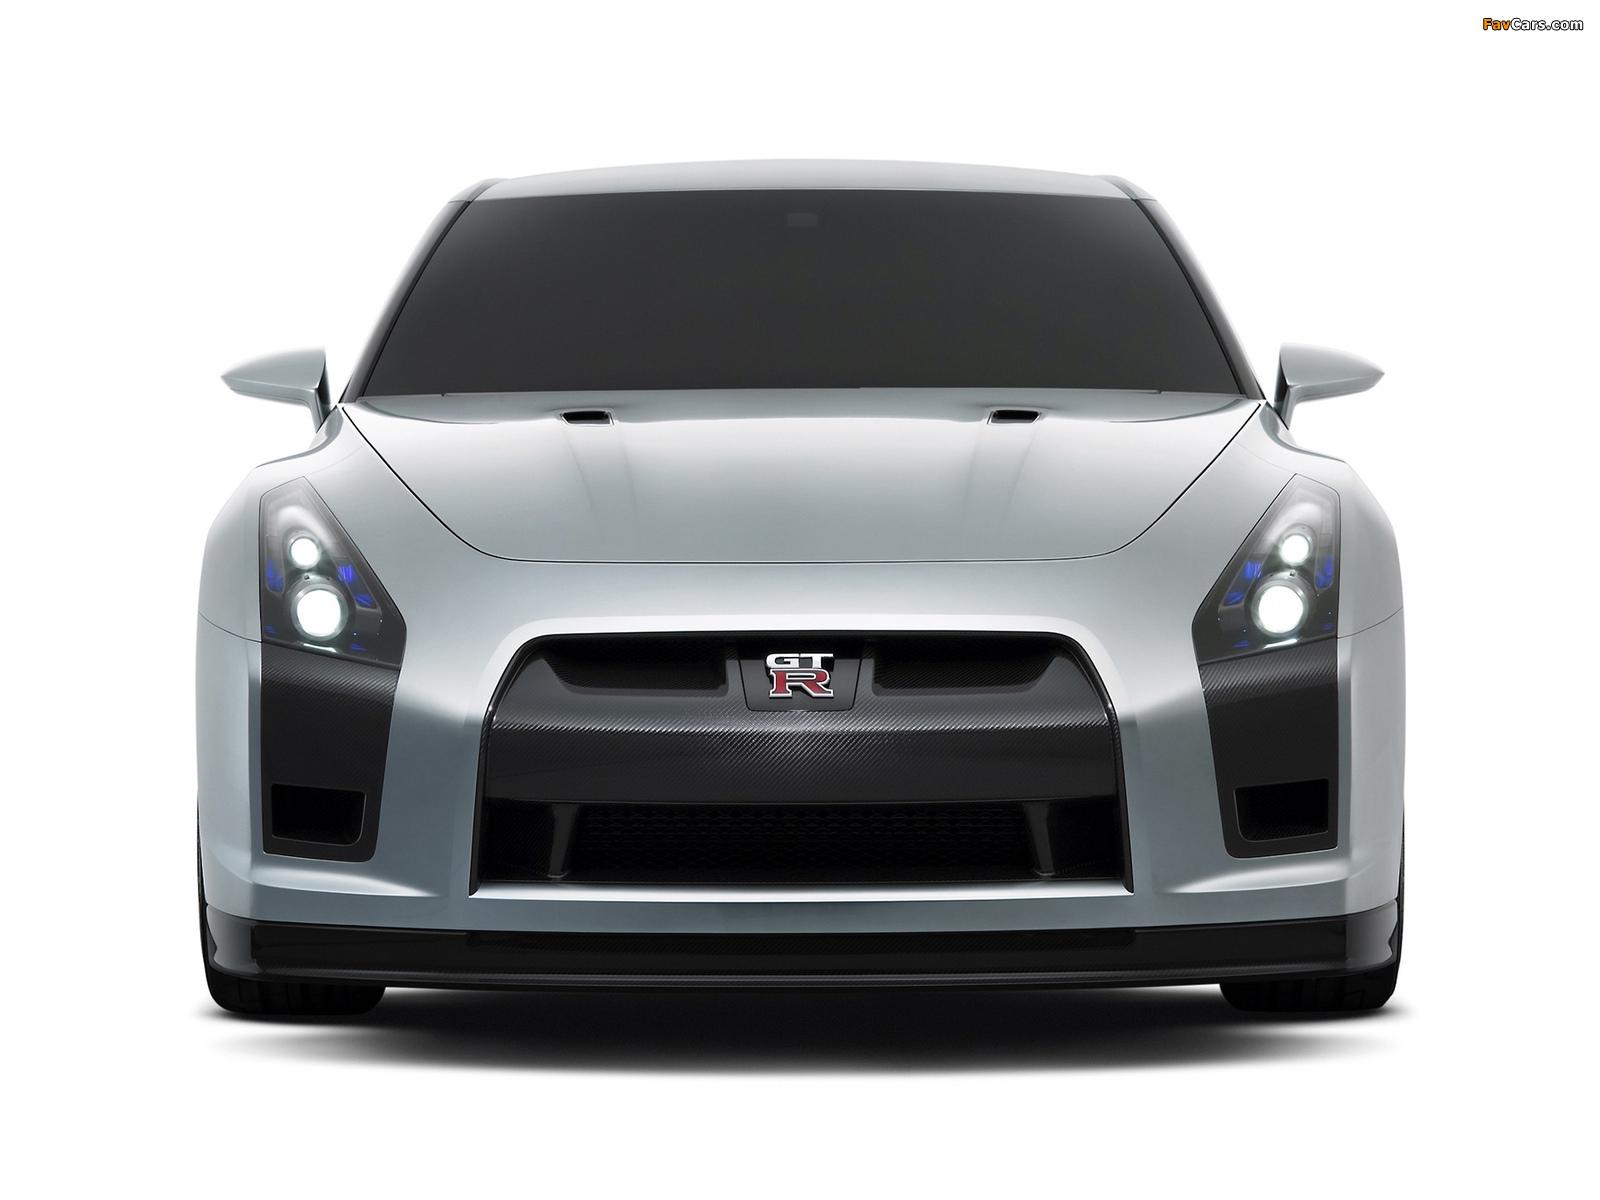 Nissan GT-R Proto Concept 2005 photos (1600 x 1200)